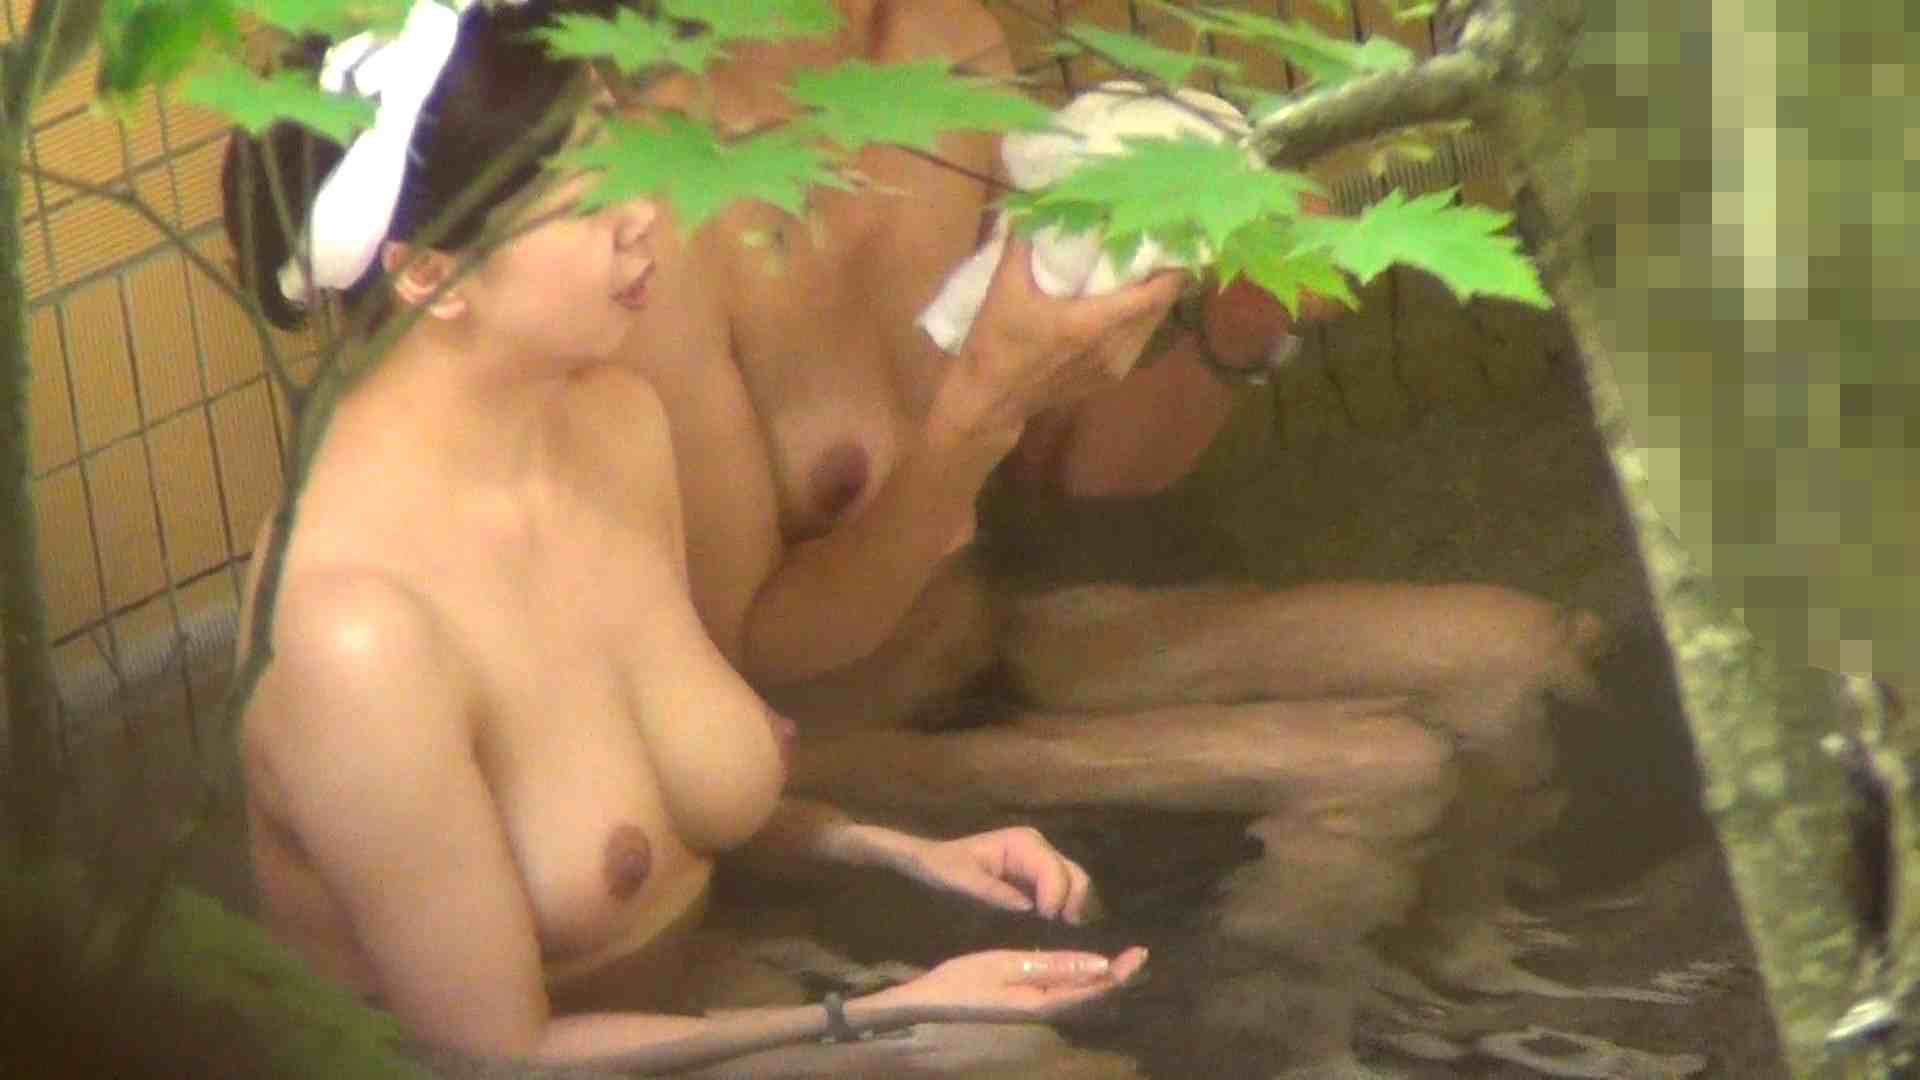 Vol.29 ピンクとブラウンの爆乳コンビ 美女H映像   高画質  70画像 42